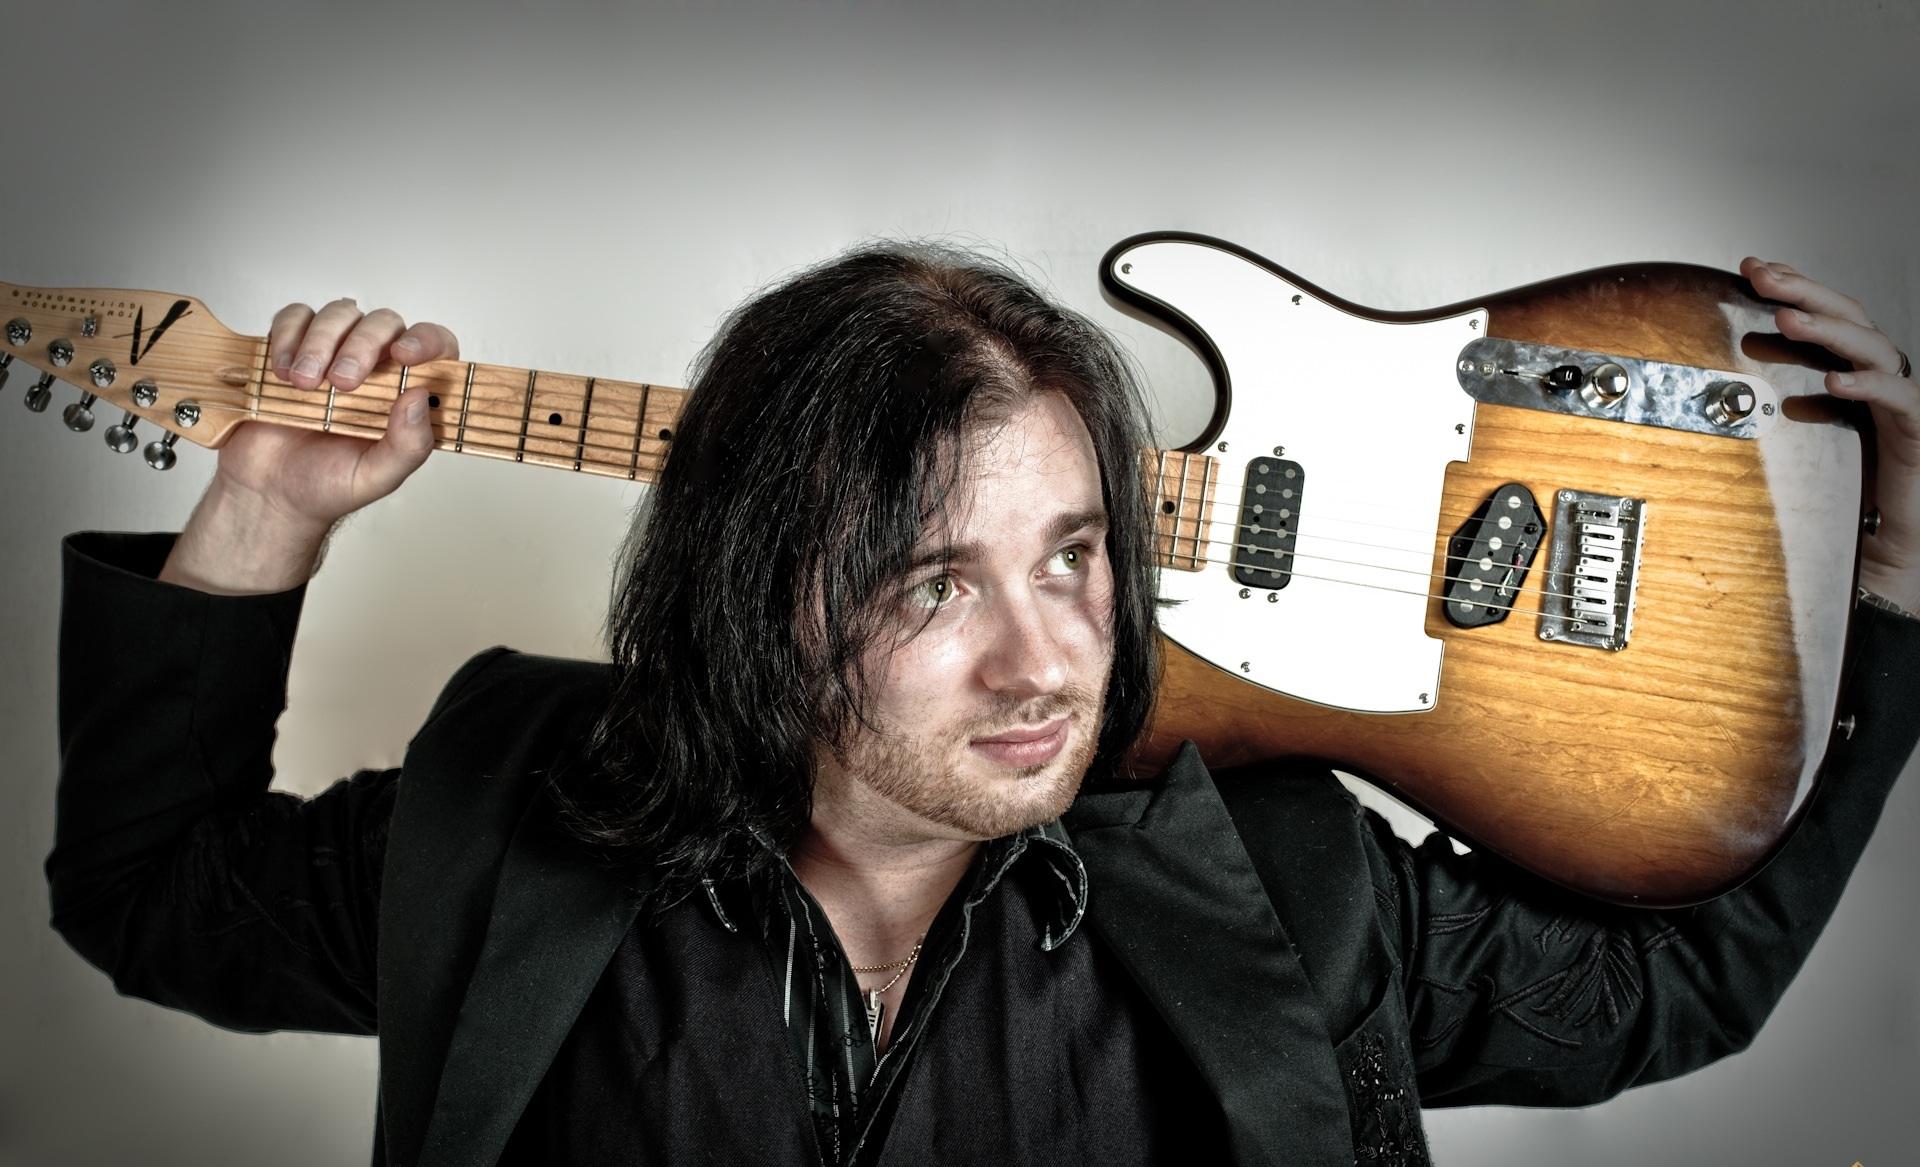 алекс руис гитарист фото сравнить катрана